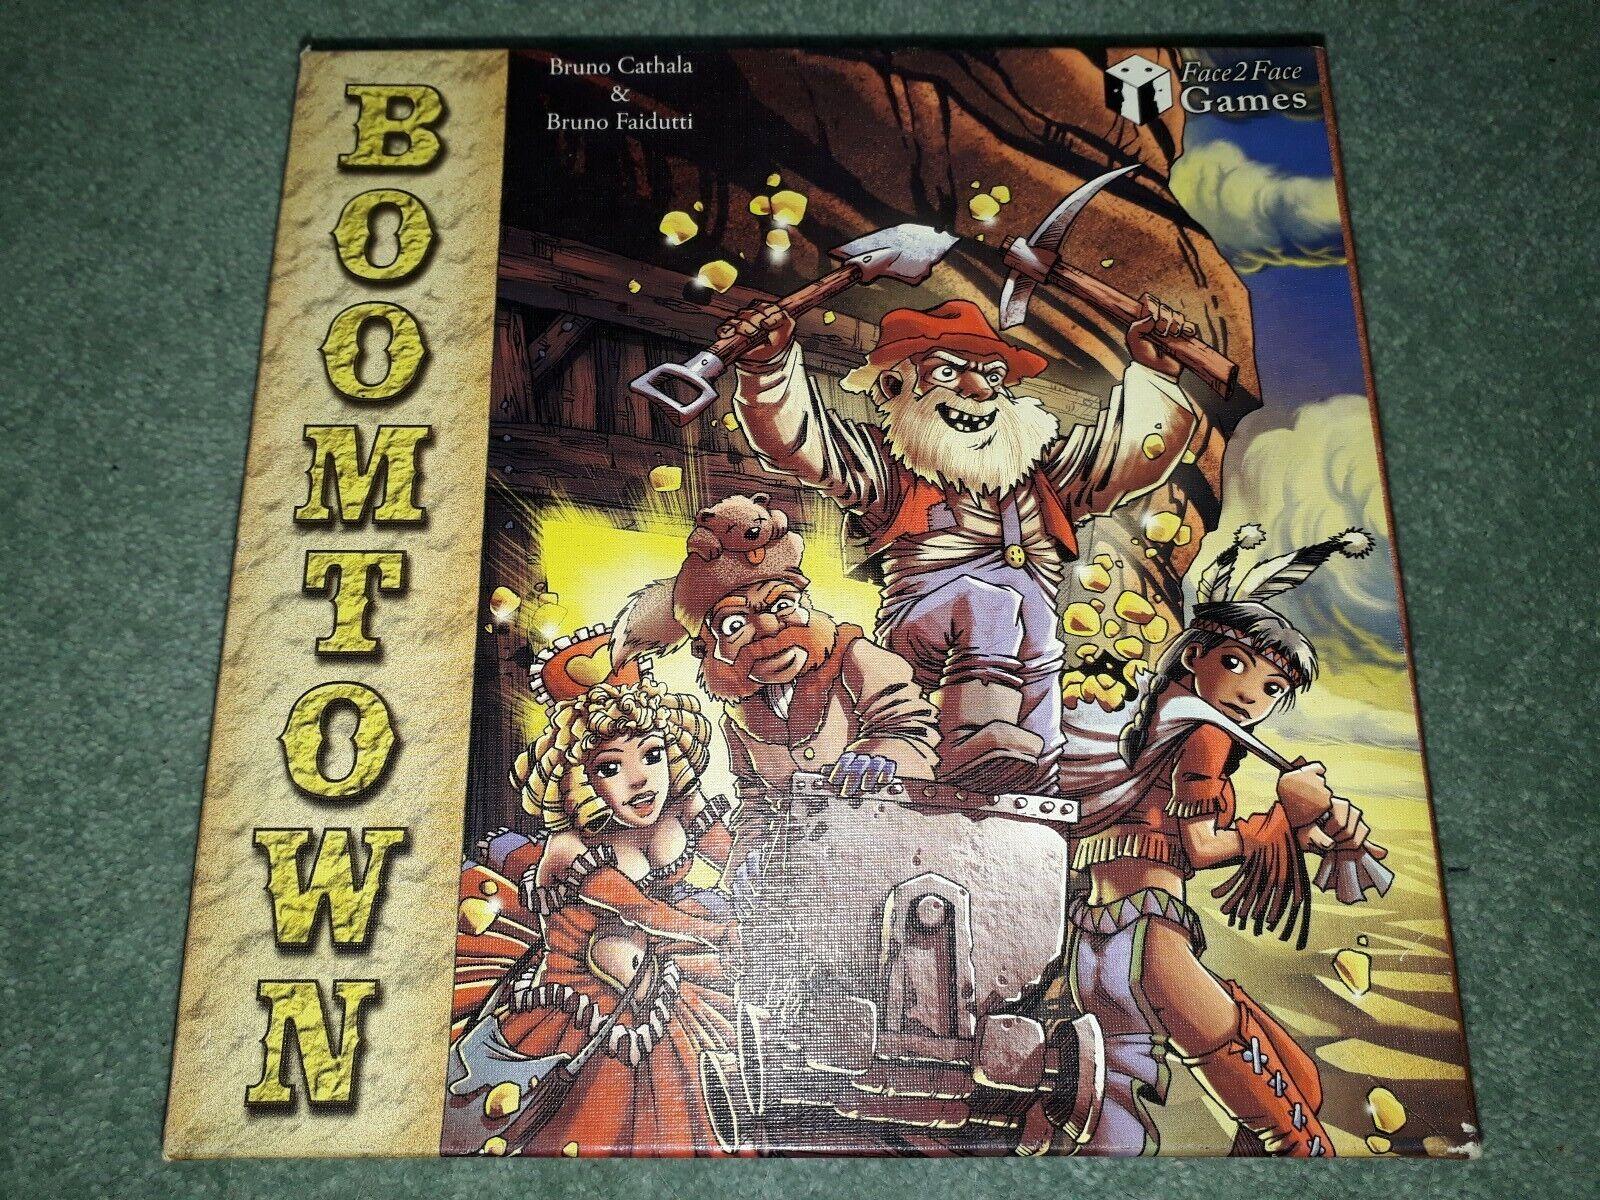 Boomtown Western Prospector oro Rush Juego Juegos Cochea Cochea 2 2004